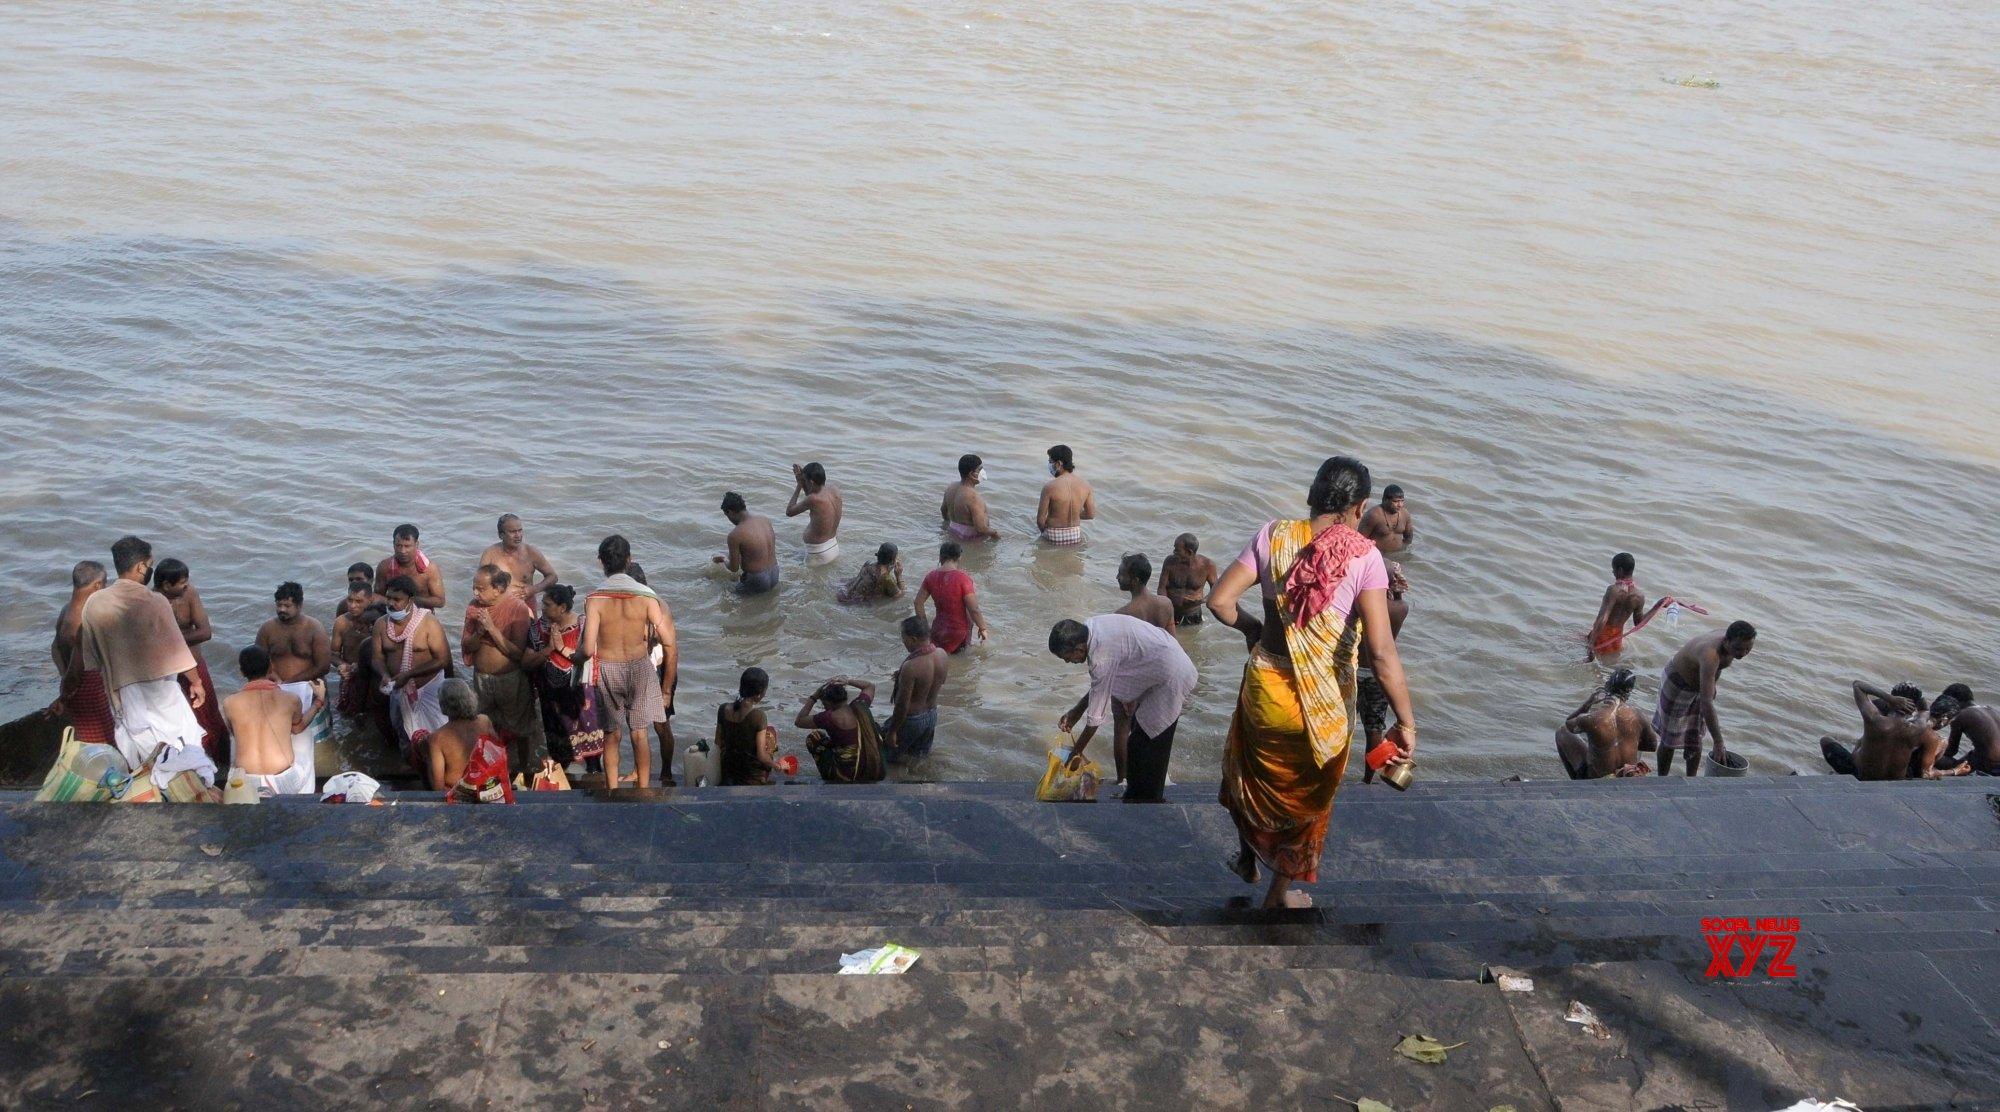 Kolkata: Devotees perform 'Tarpan' on the last day of 'Pitru Paksha' on the banks of Ganga river #Gallery